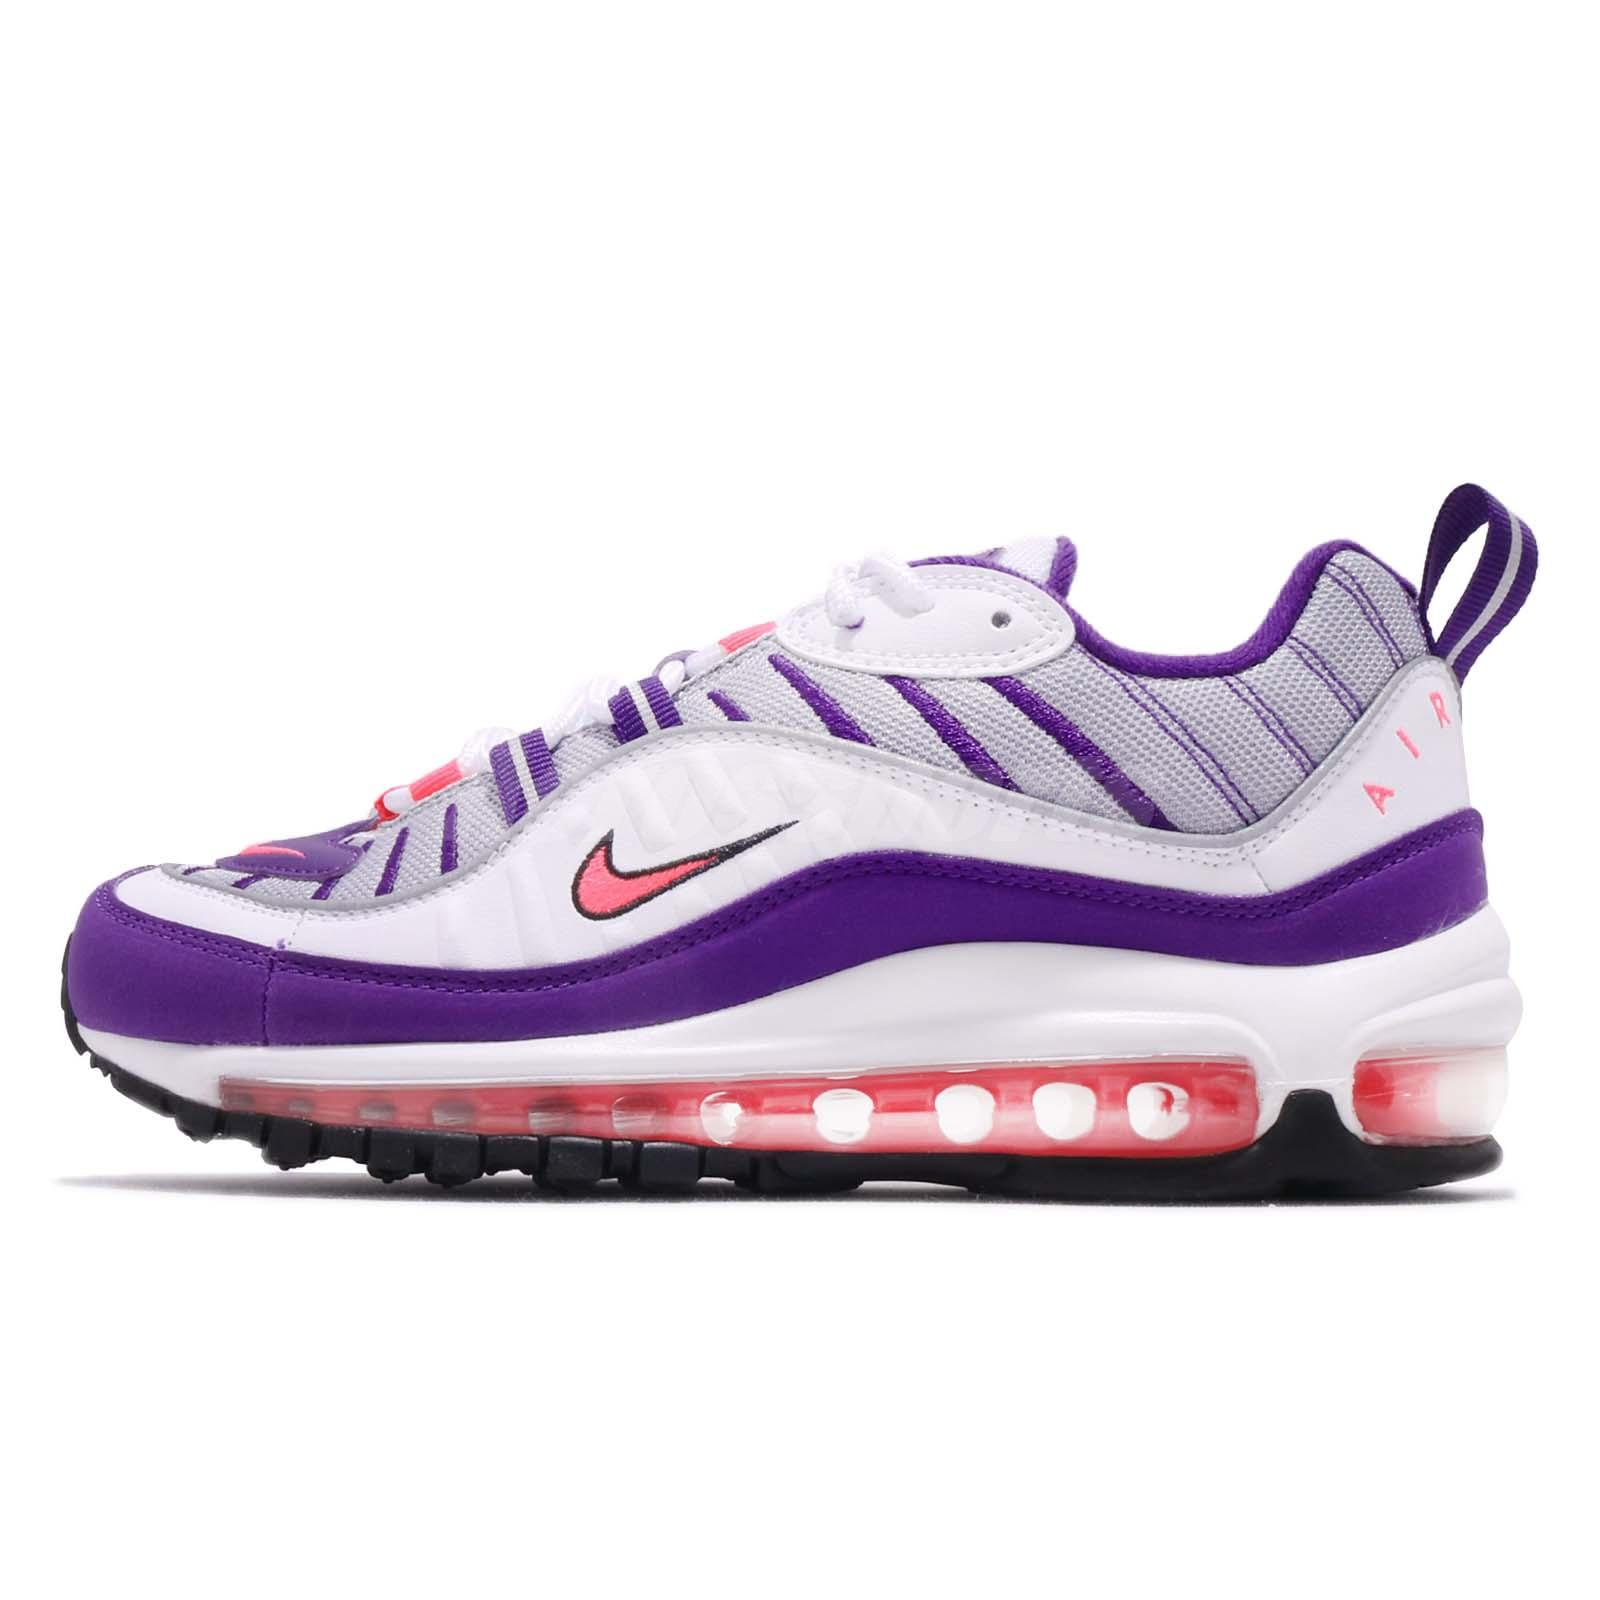 100% authentic 340f5 4baa5 Nike Wmns Air Max 98 Raptors White Purple Pink Women Running Shoes  AH6799-110